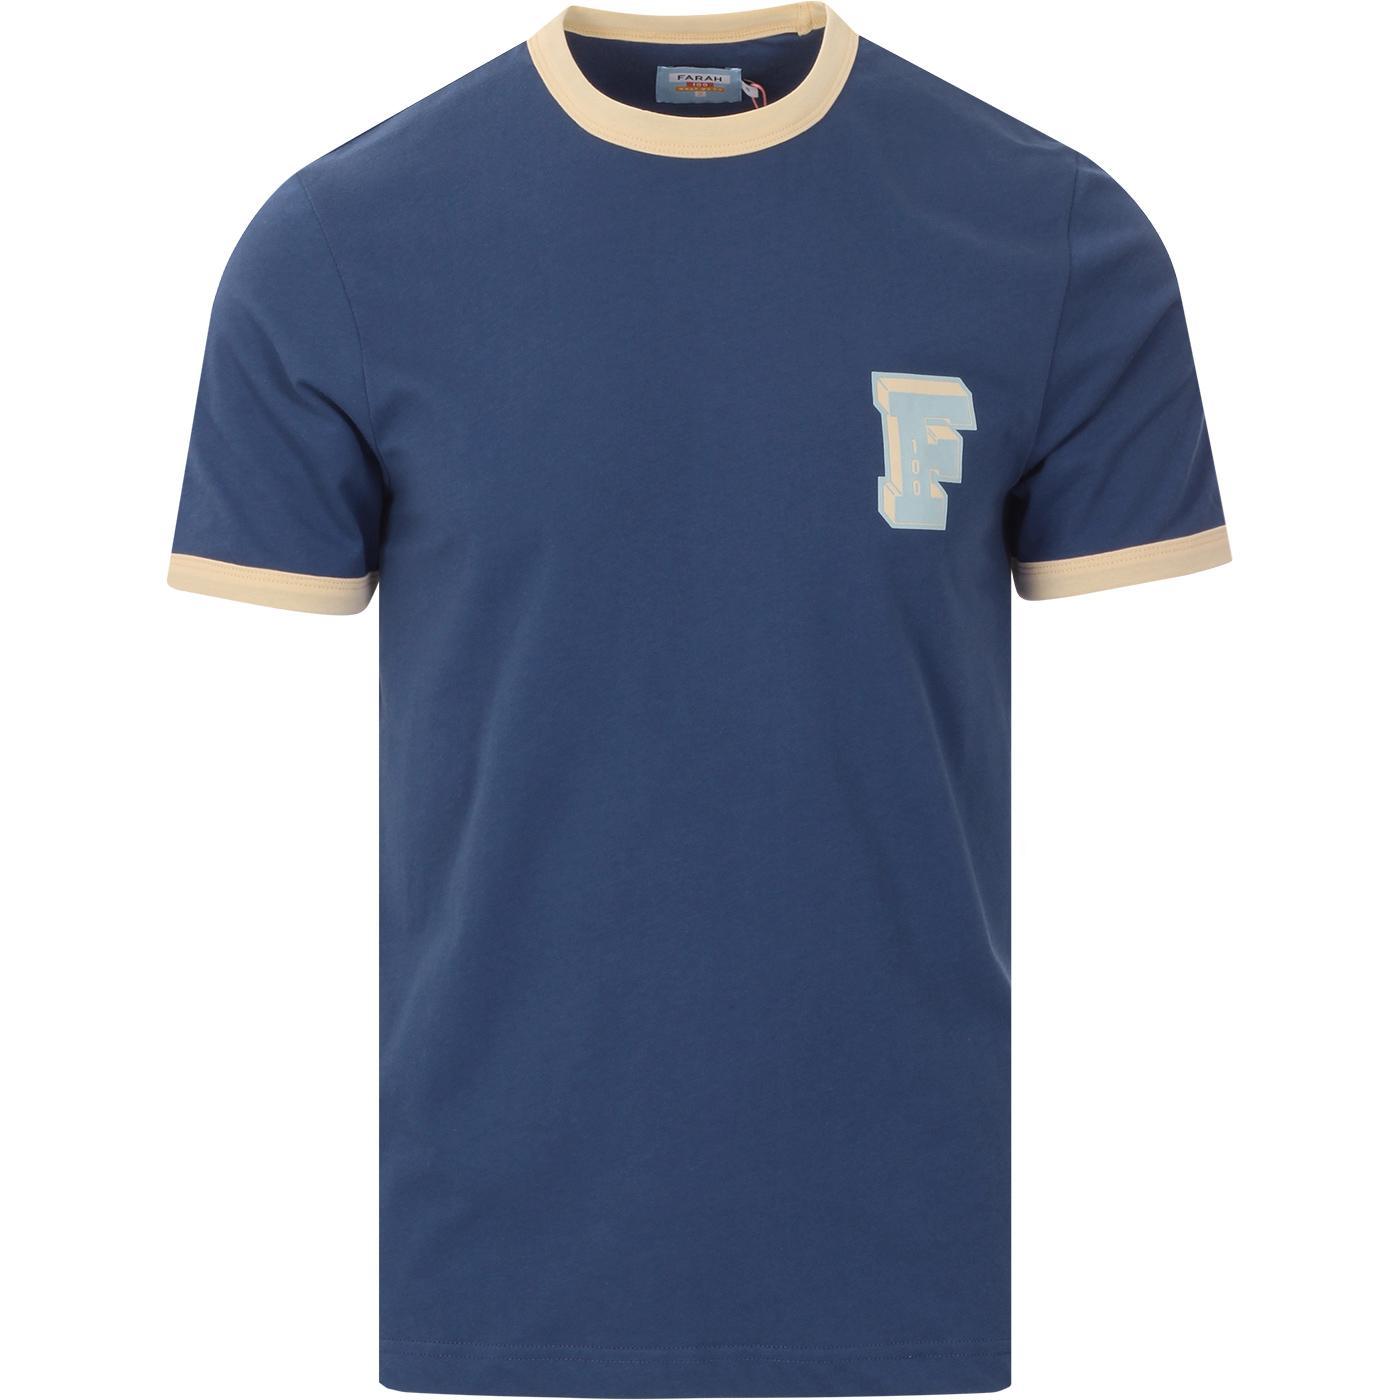 Bliss FARAH 100 Retro 70s Mod Ringer T-shirt (DB)